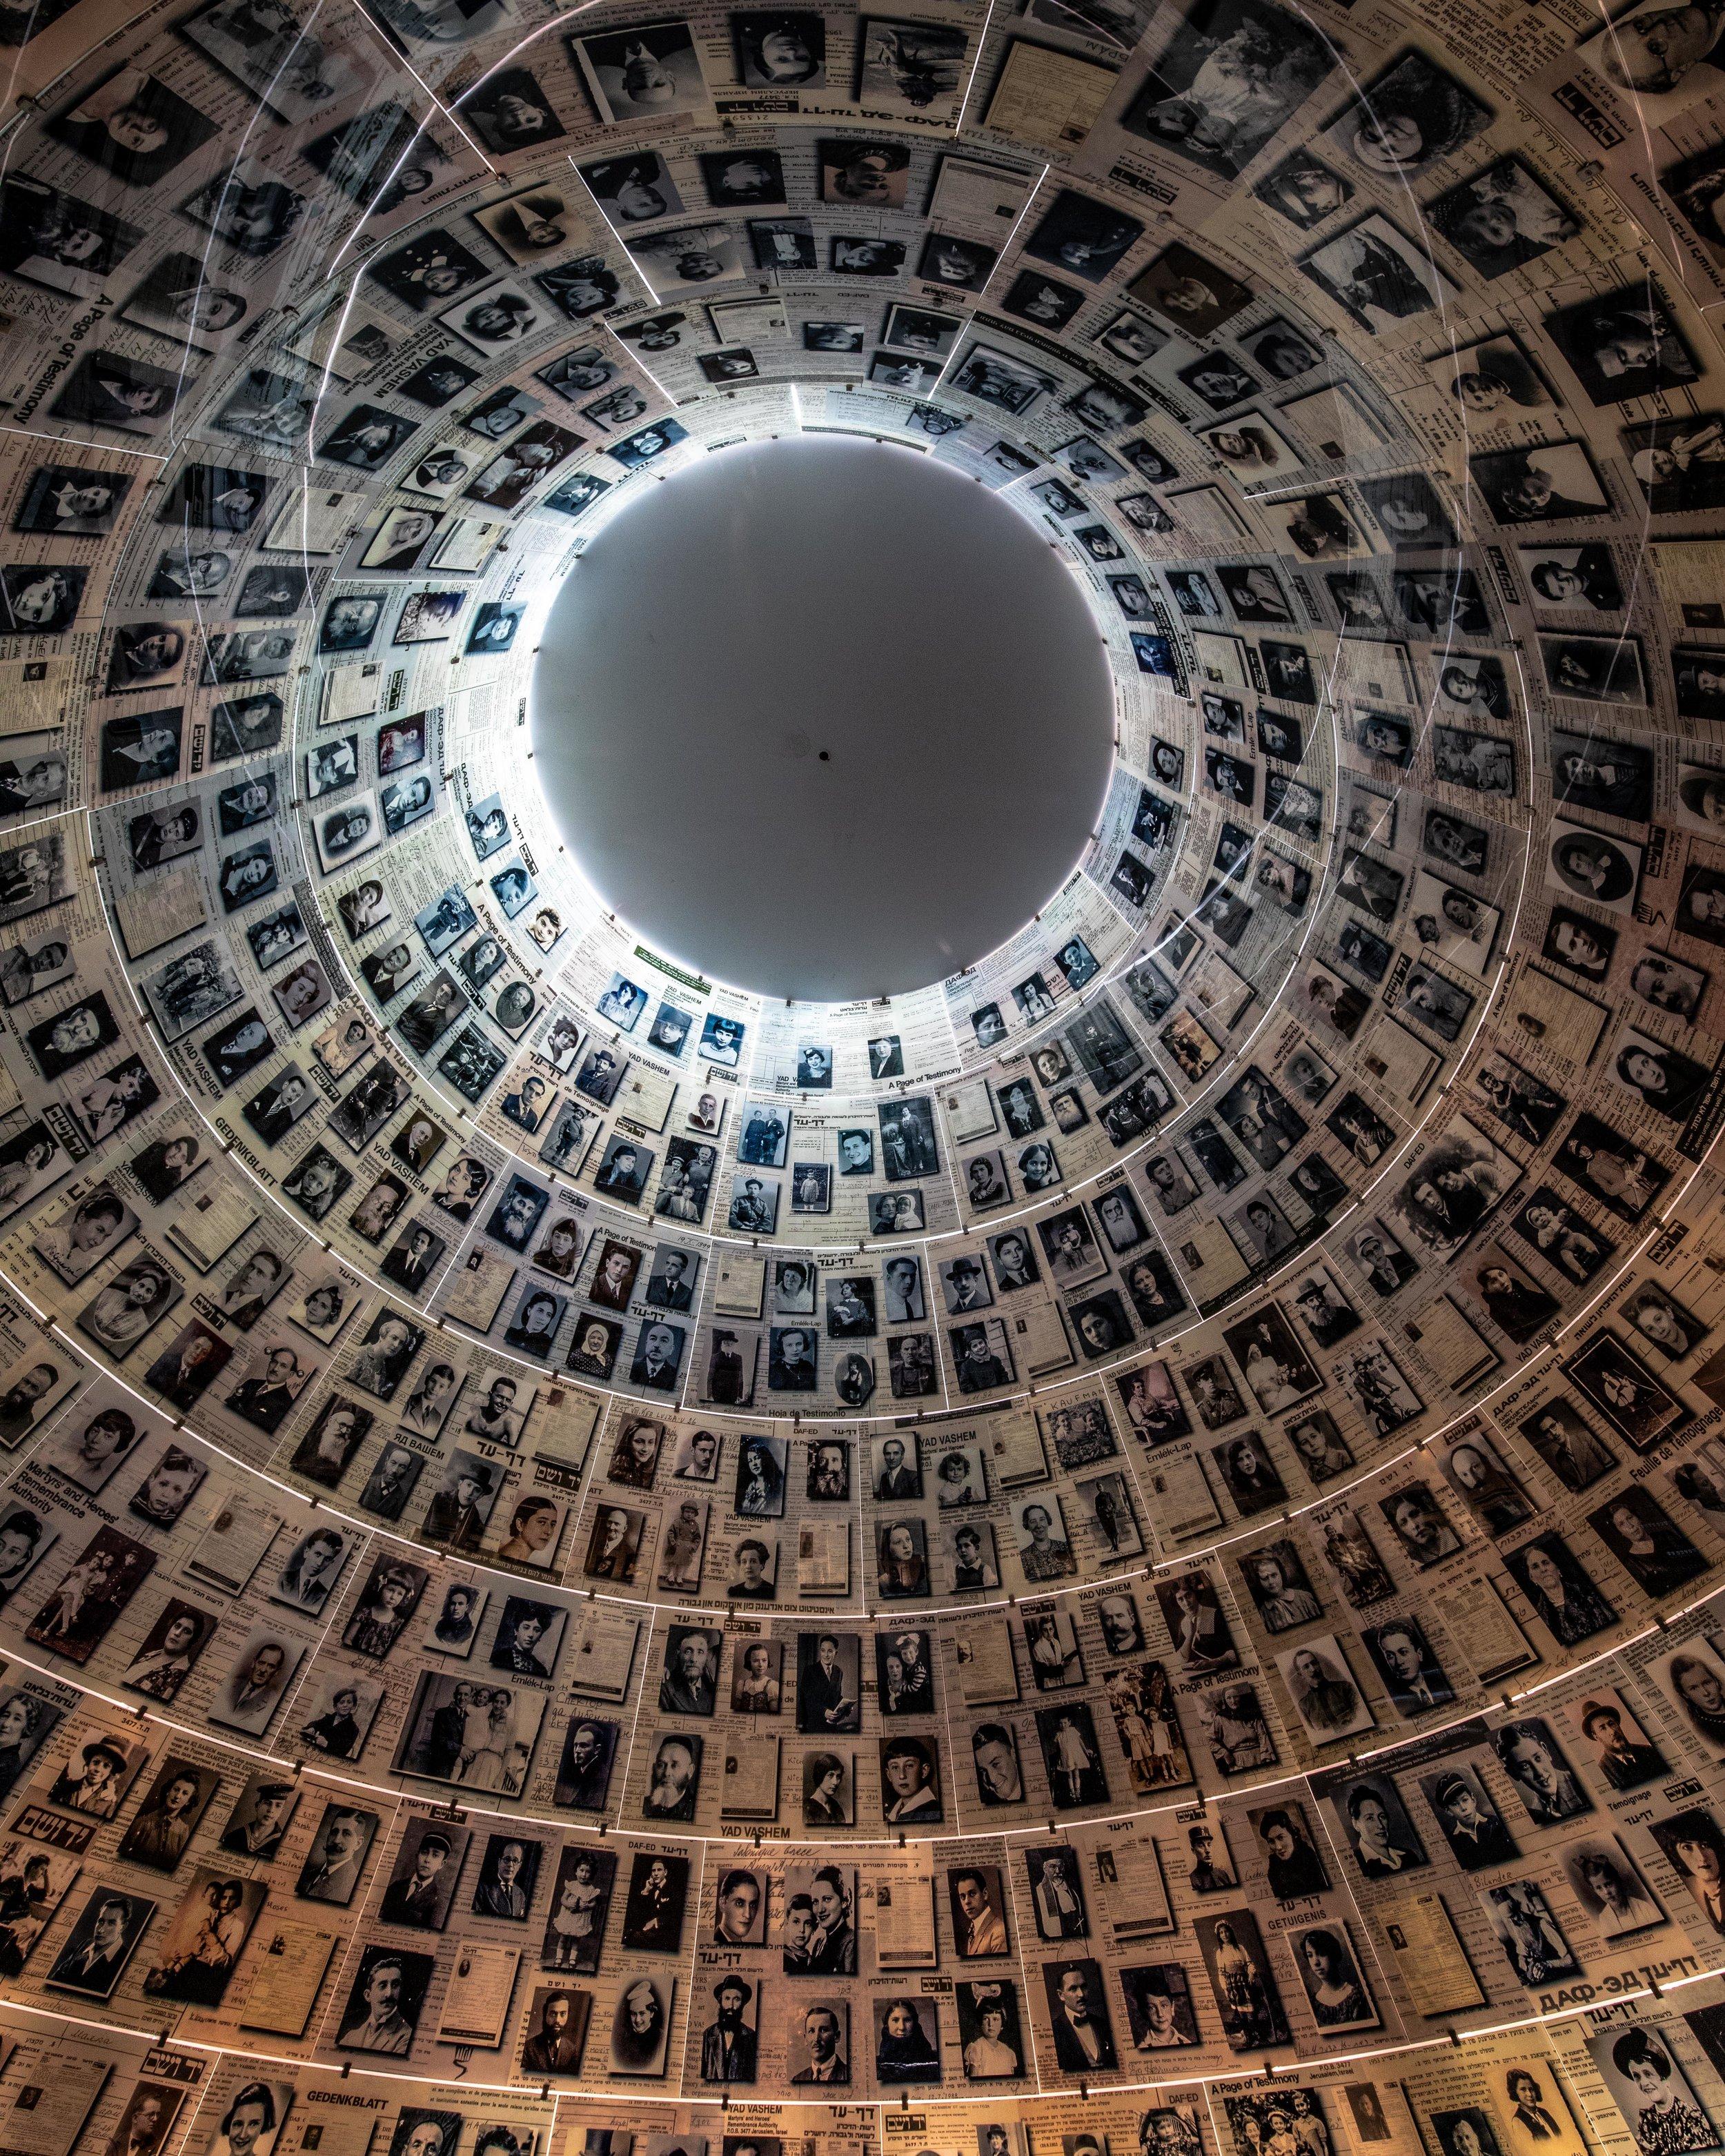 Yad Vashem - the Holocaust Museum in Jerusalem